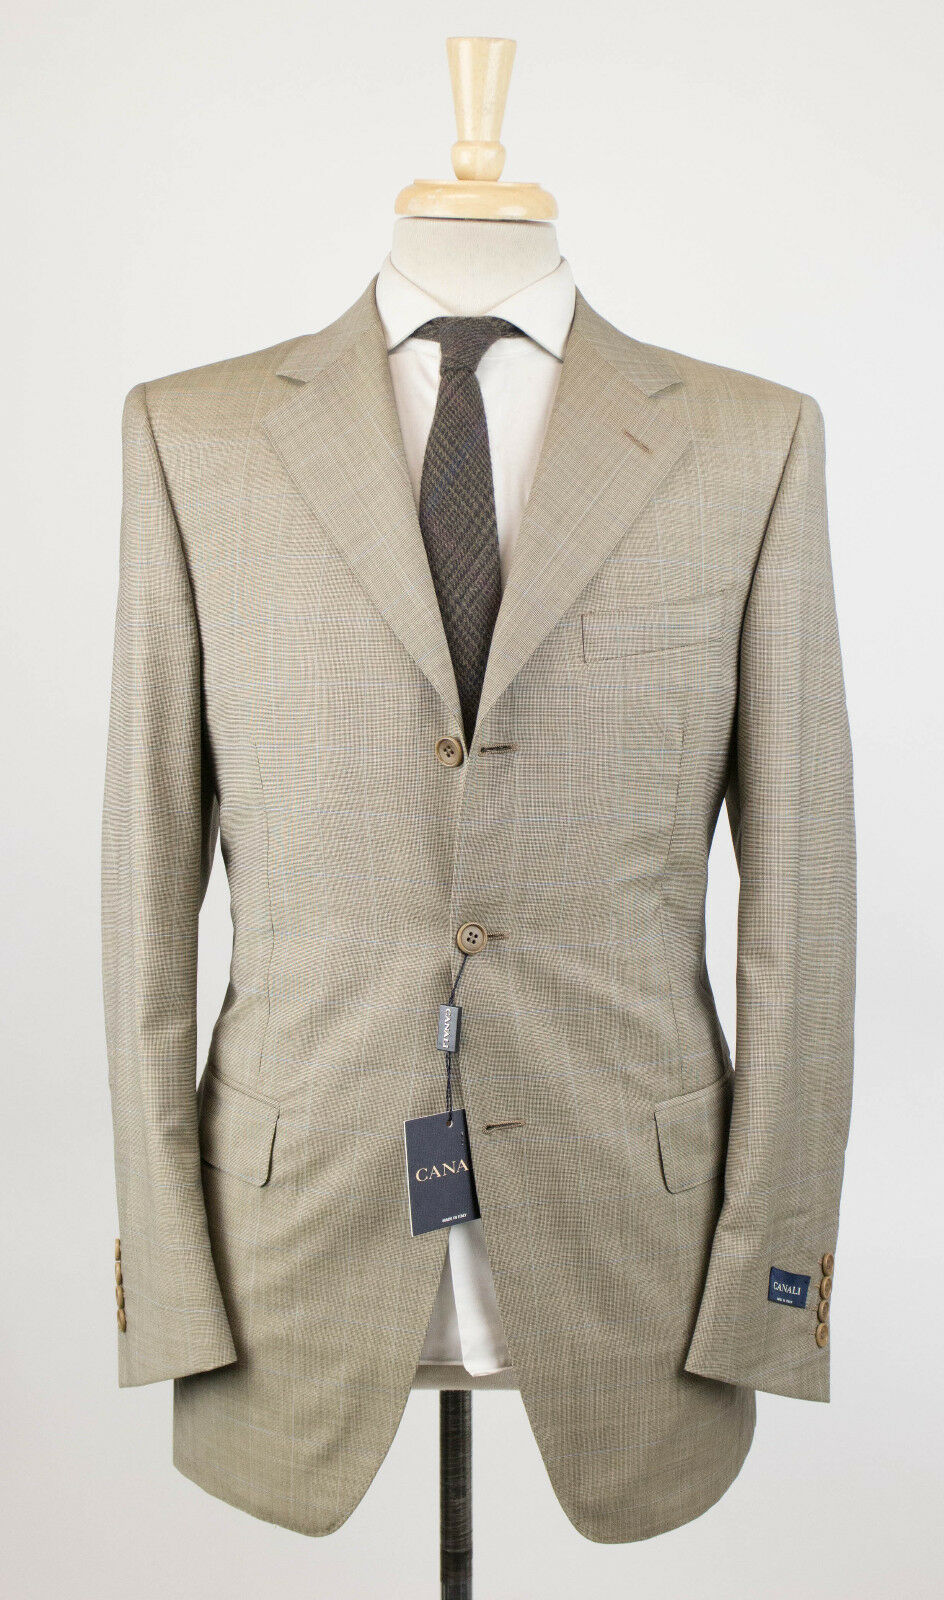 New. CANALI Beige Plaid Wool 3 Button Suit Größe 48/38 R Drop 4 2350